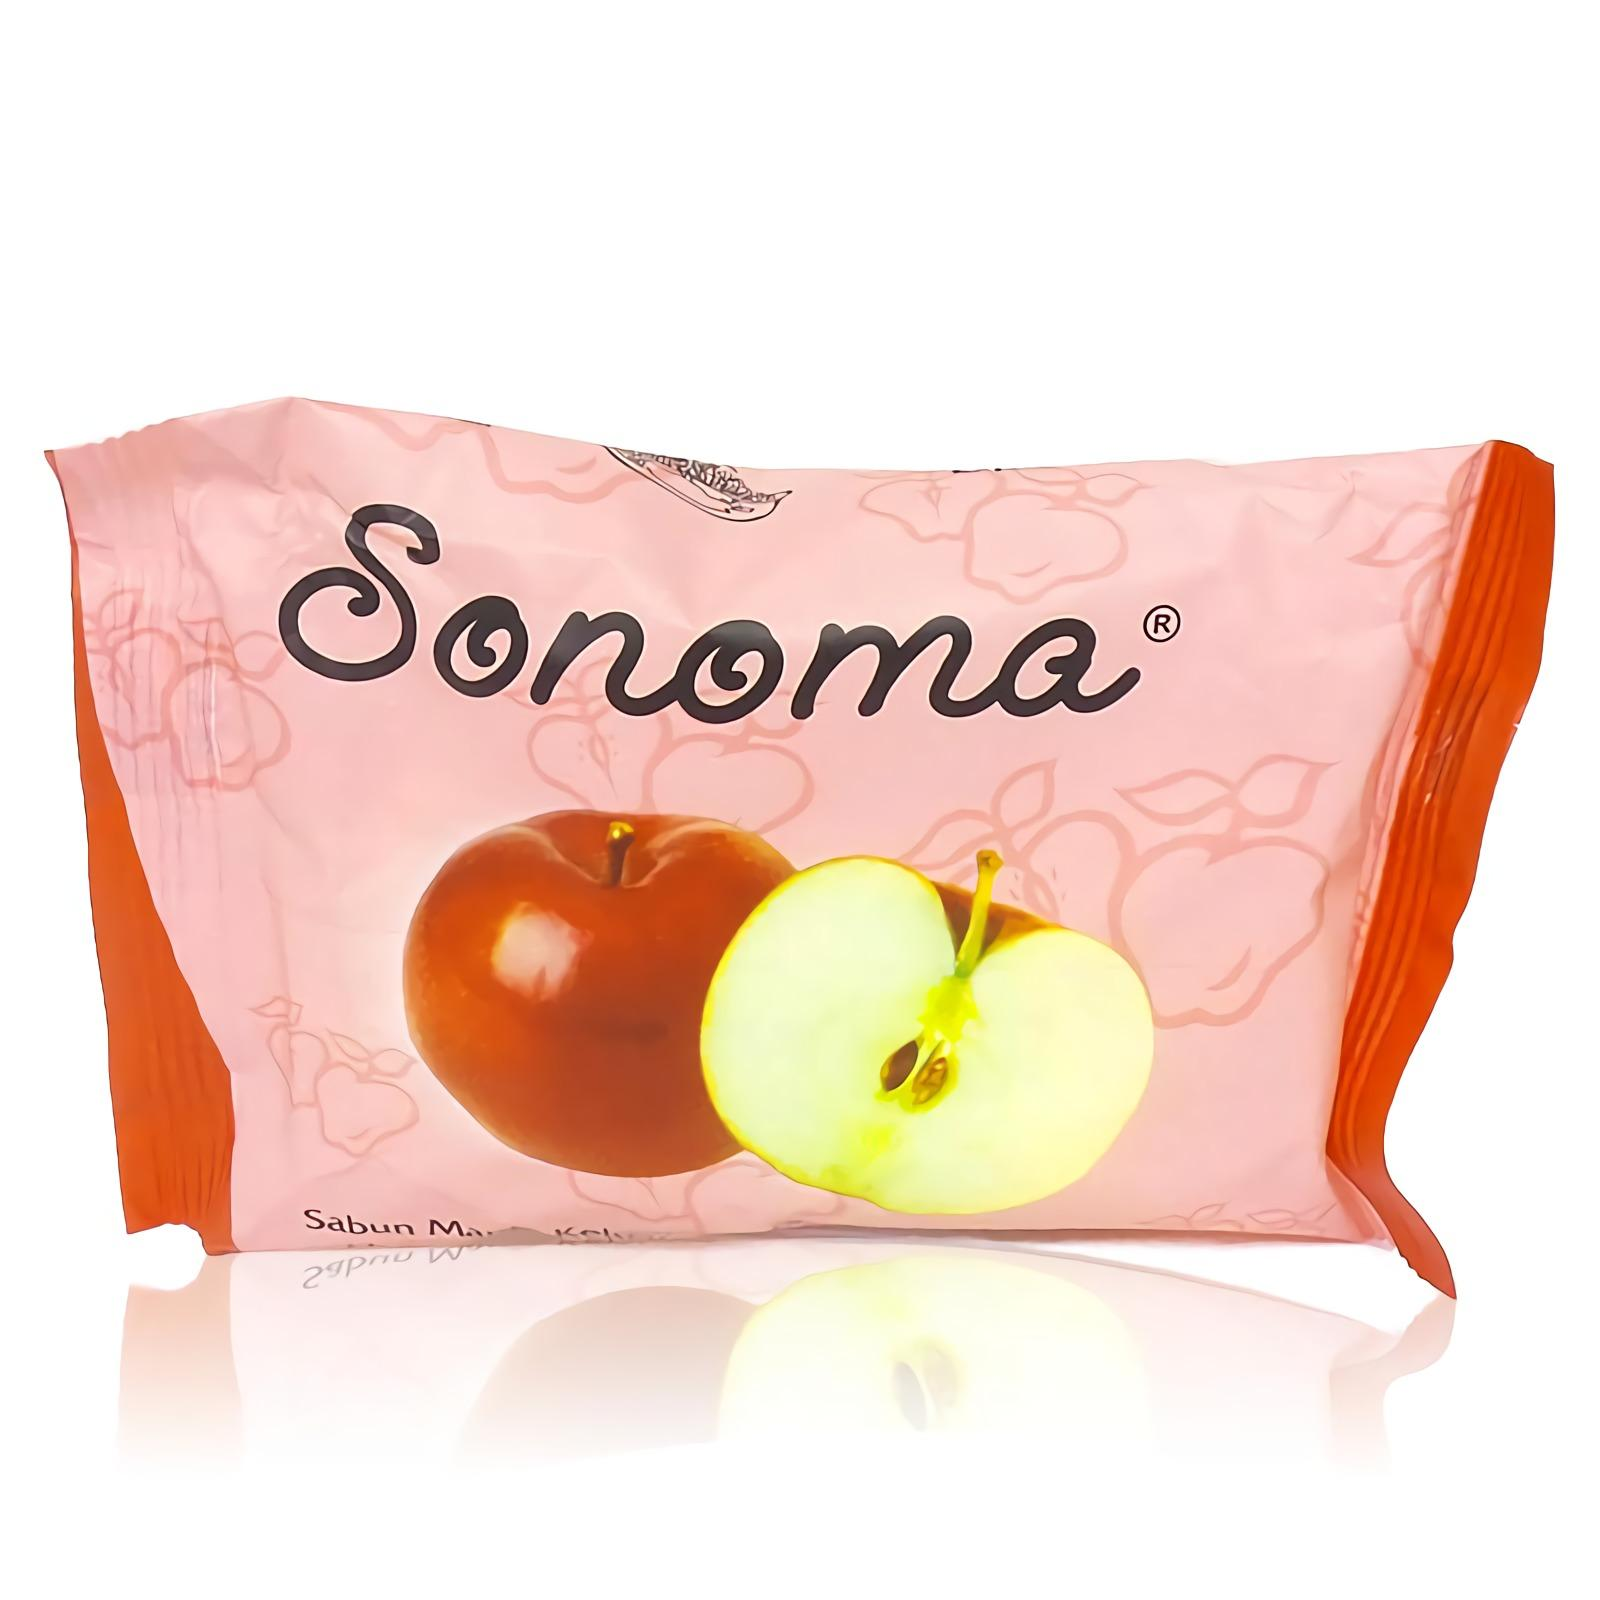 Daftar Harga Citra Natural White Sabun Terbaru 2018 Cek Murahnya Lulur Pearly Batang Dapat 2 Sonoma Asi Fruity Apple Soap 70g Batangan Moisturizing Bar Pure Harmony